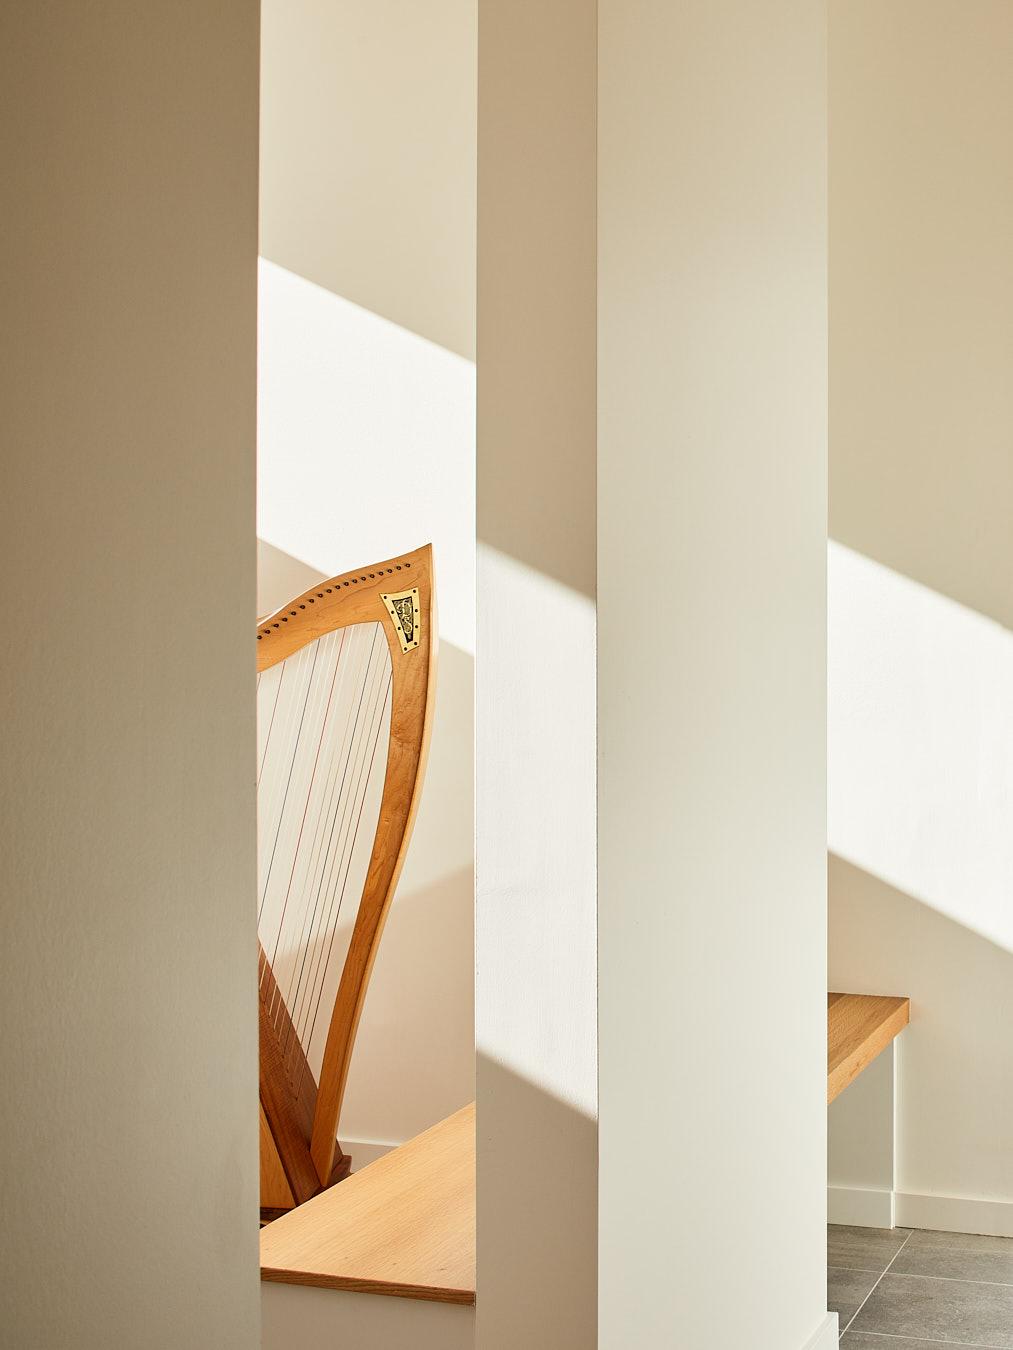 028-Shean Architects Fentiman.jpg